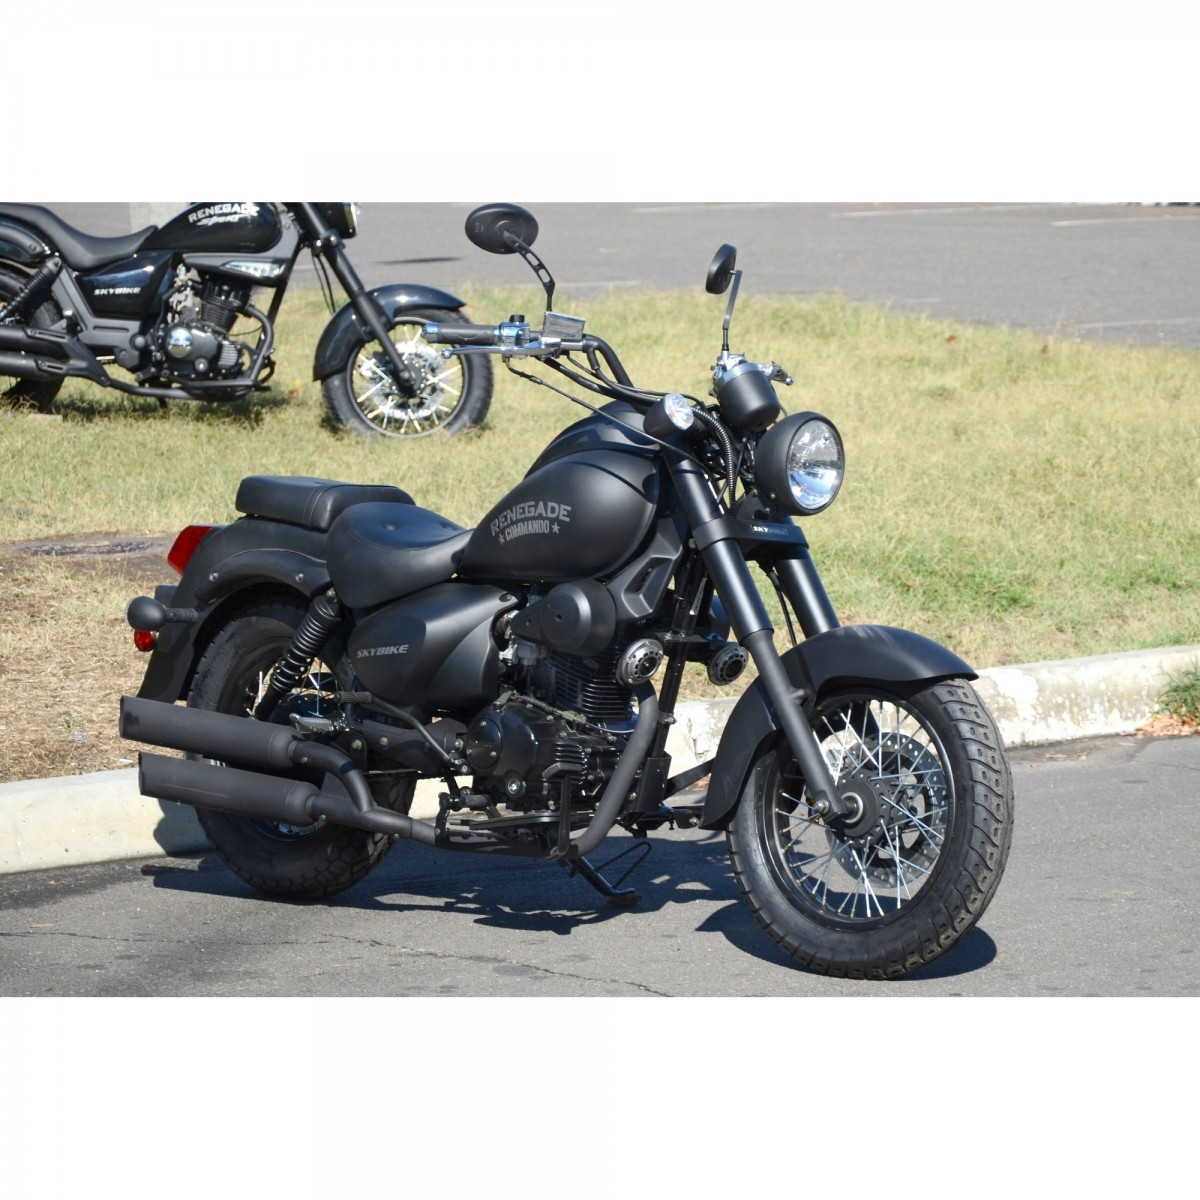 Skybike Renegade 200 (gs-5339)